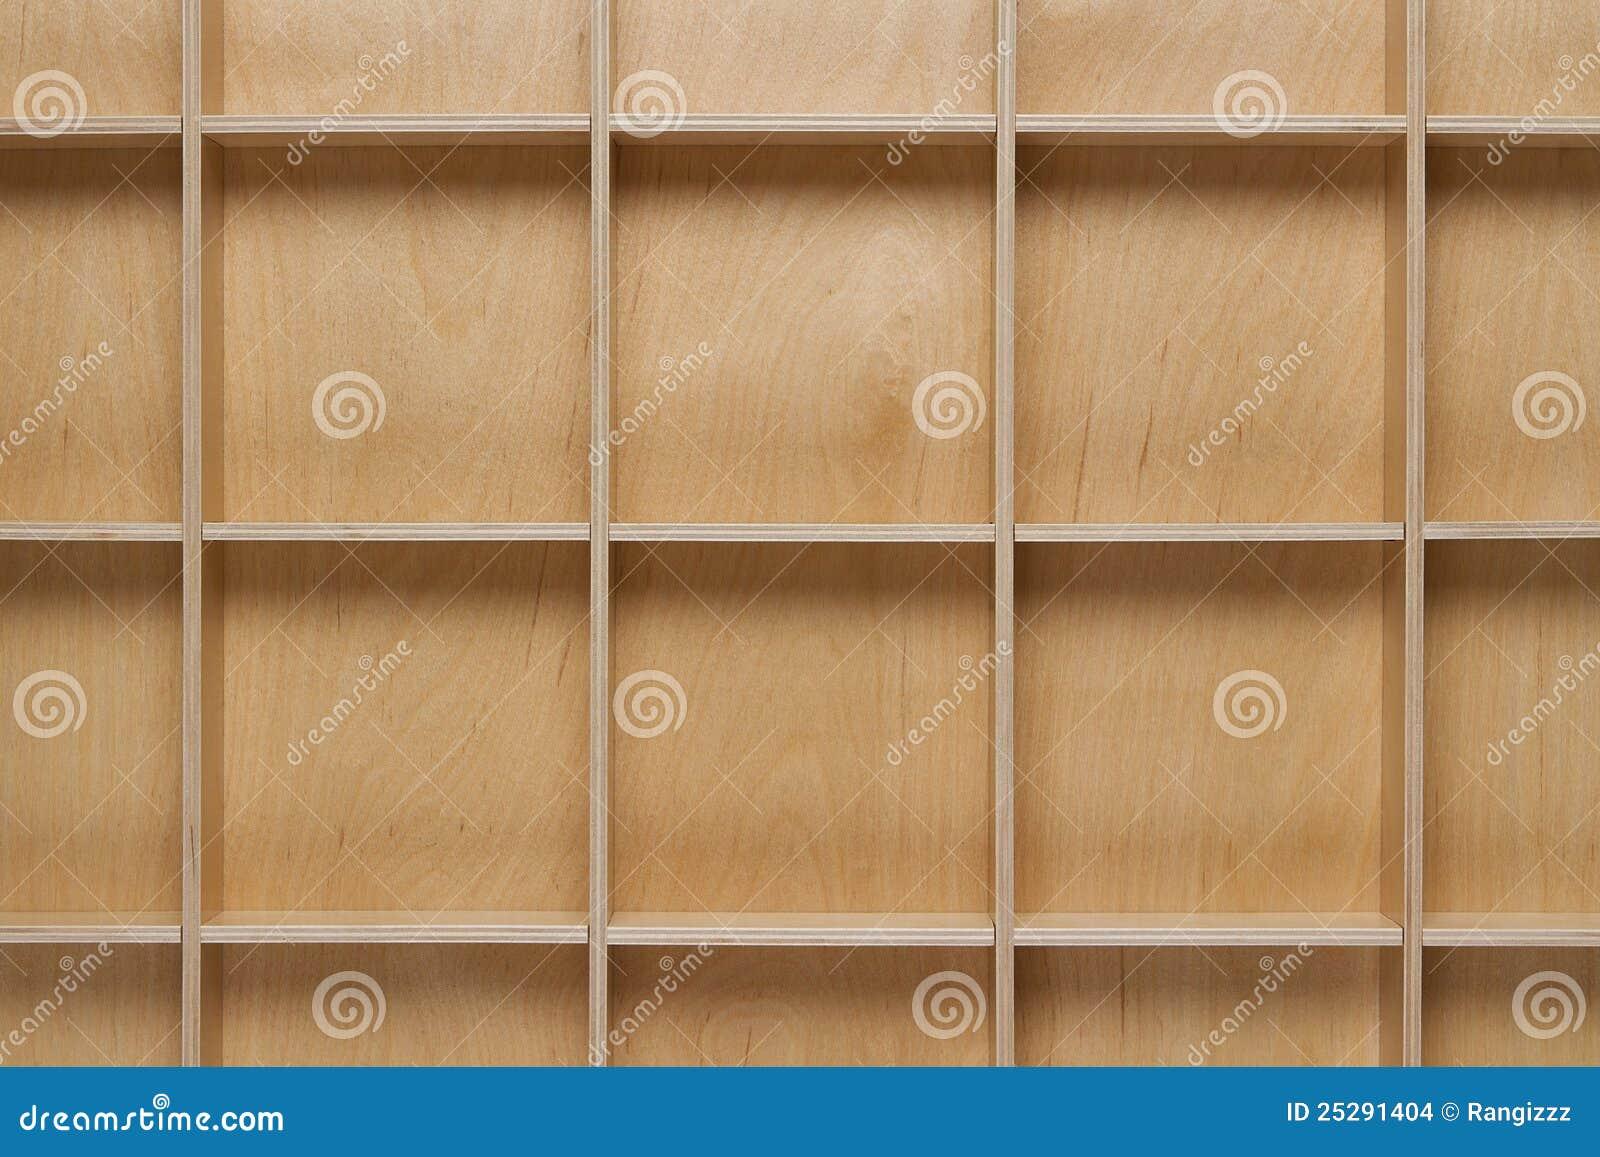 Empty Wooden Bookshelf Stock Images Image 25291404